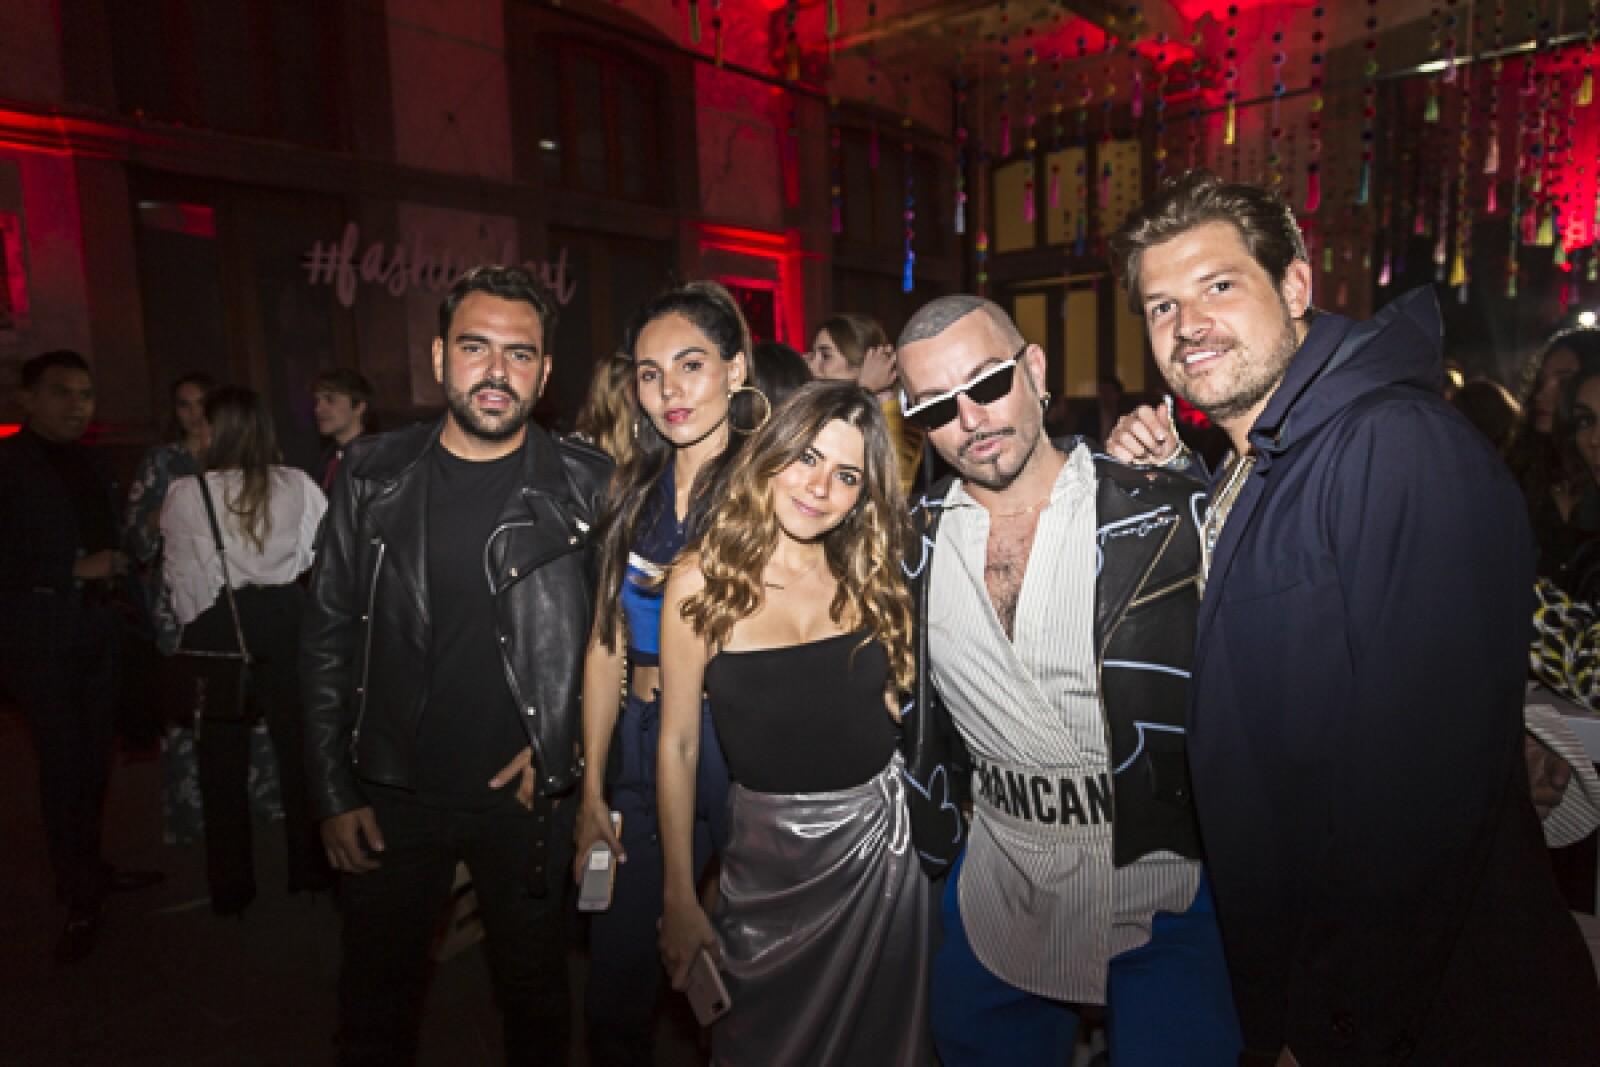 Alfonso de Bustos, Haru Escarcega, Karina Torres, Mancandy, Fern